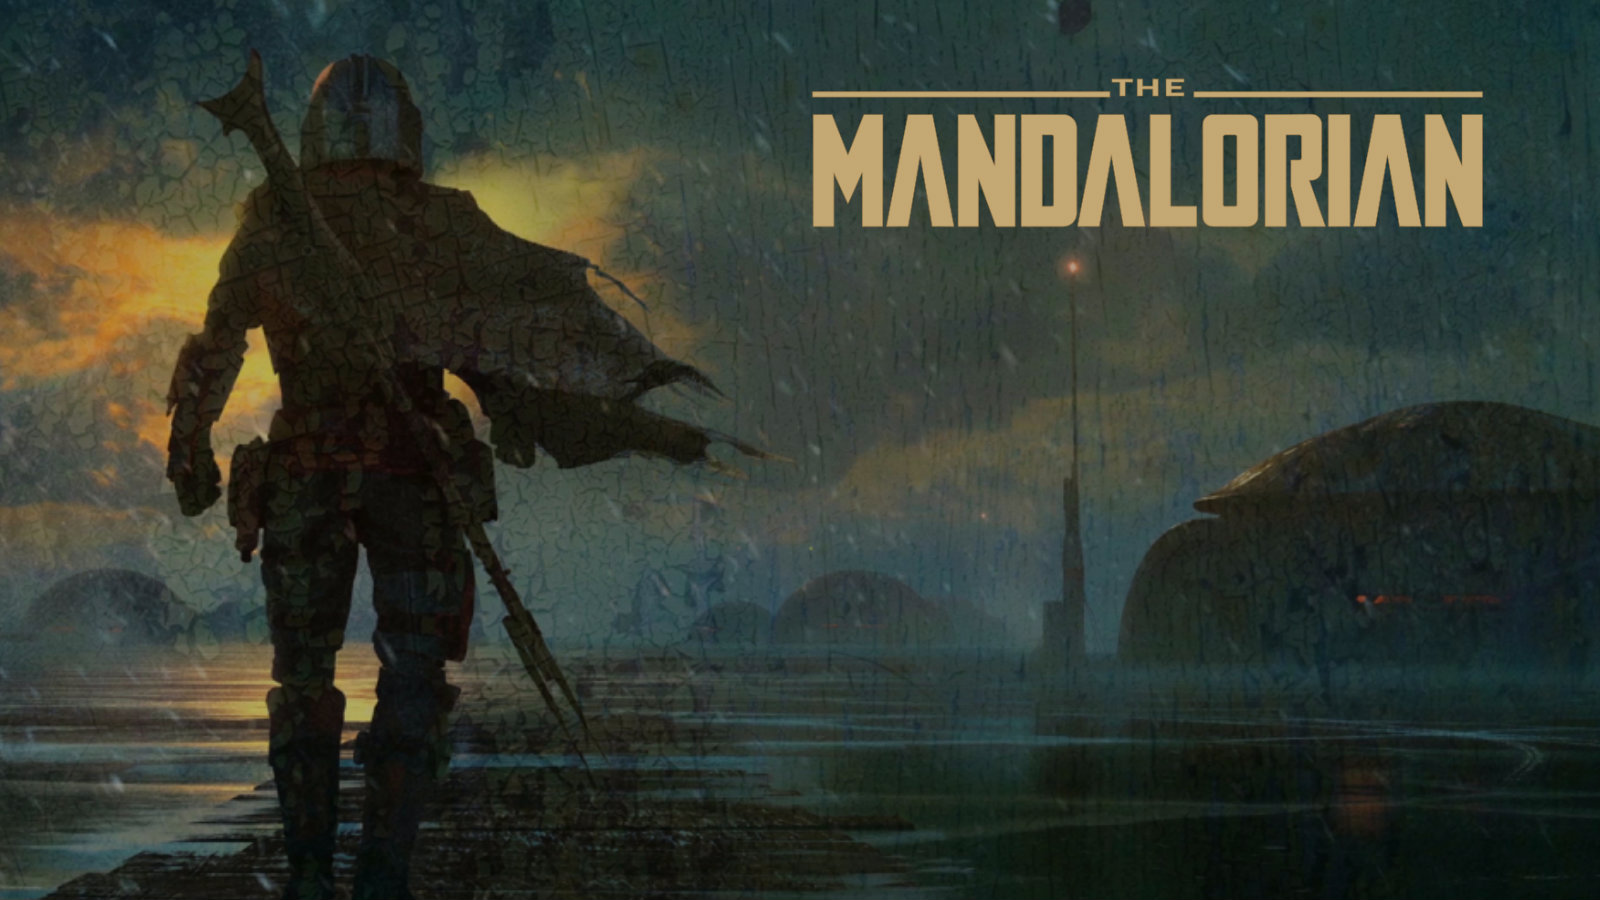 The Mandalorian Season One star wars 43208558 1600 900